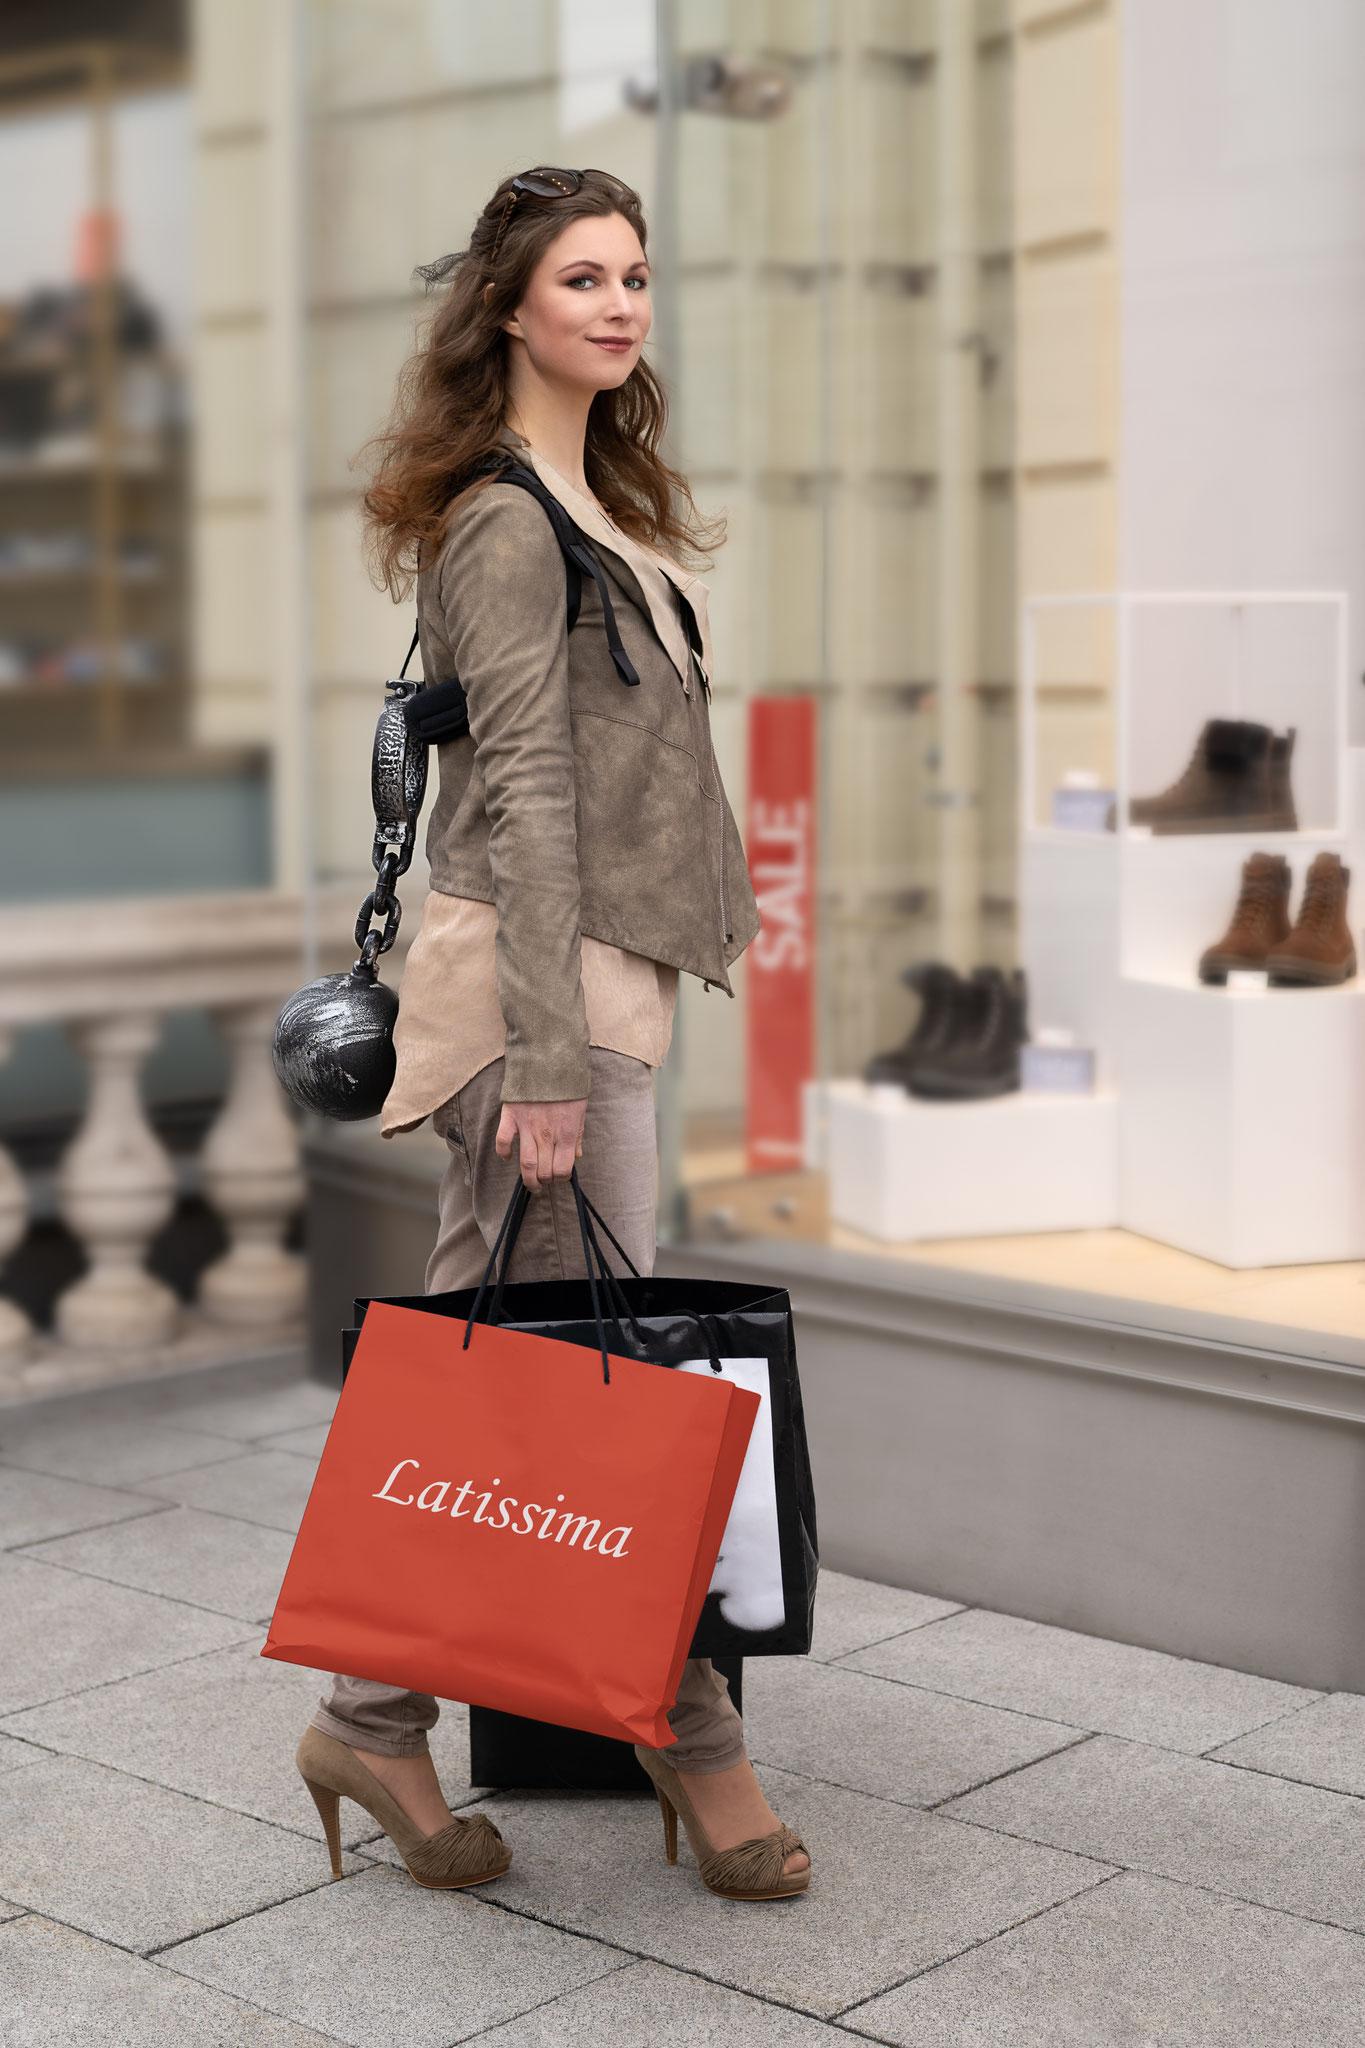 LATISSIMA - Gerade beim Shopping...